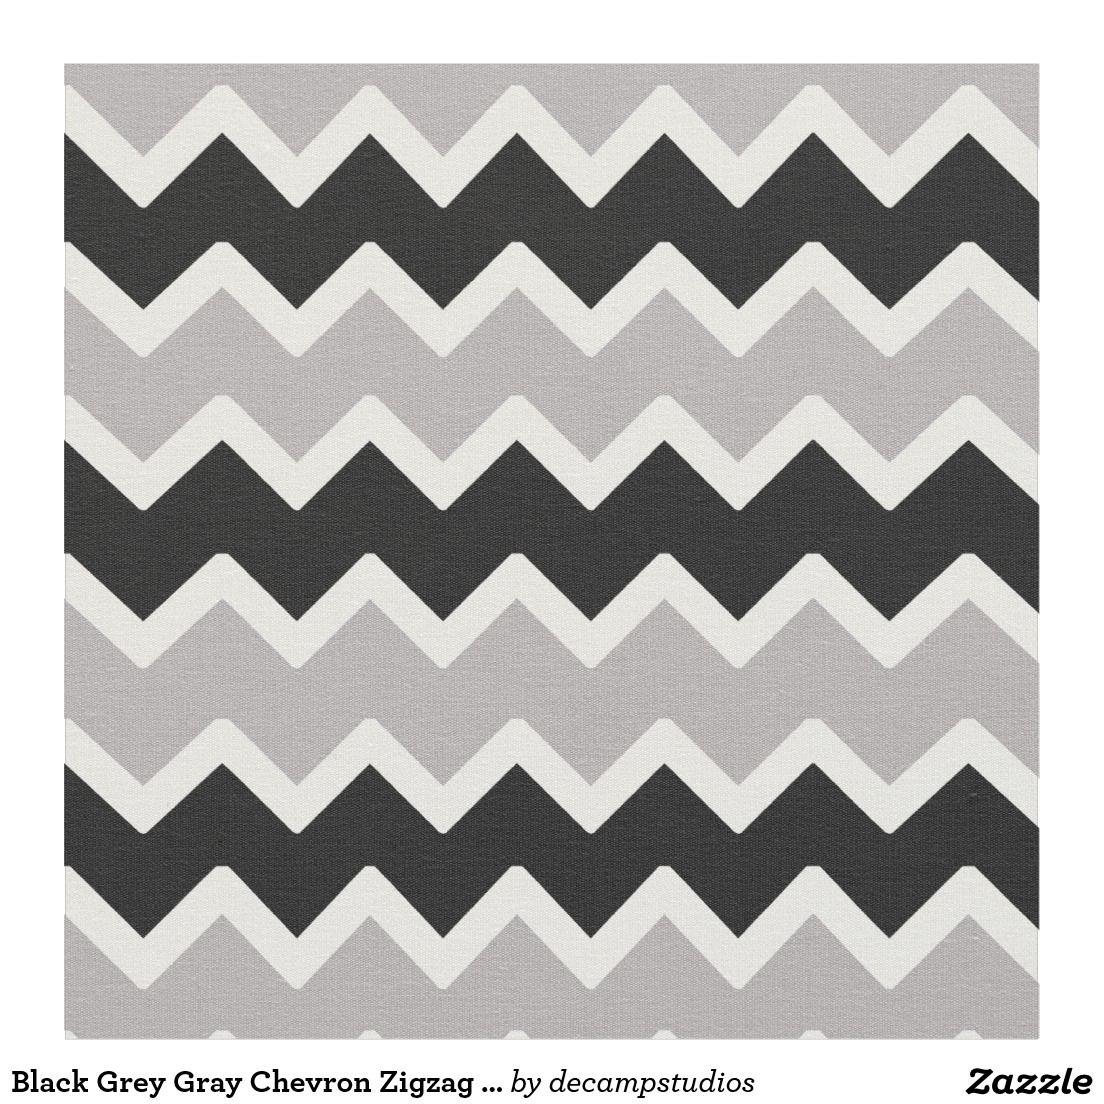 Black Grey Gray Chevron Zigzag Pattern Fabric   Chevron Room Decor ...